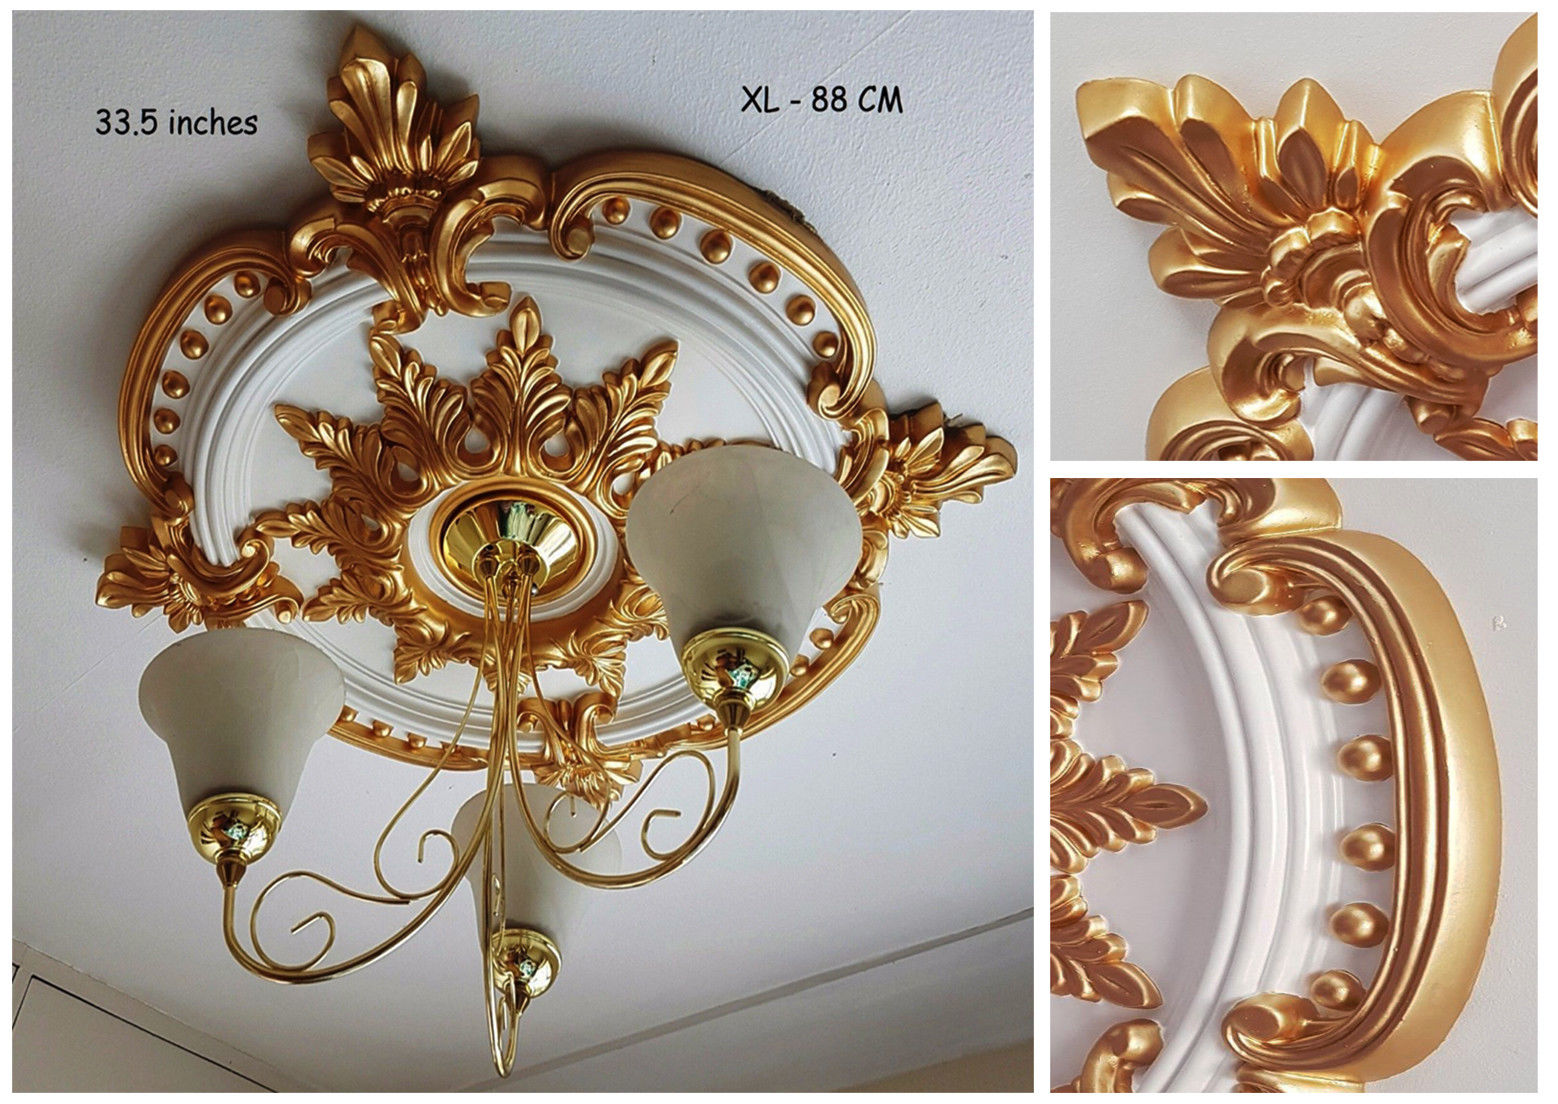 85CM LARGE Ceiling Rose Beautiful GOLD Ornate Home Decor Medallion HUGE CR7G-XL